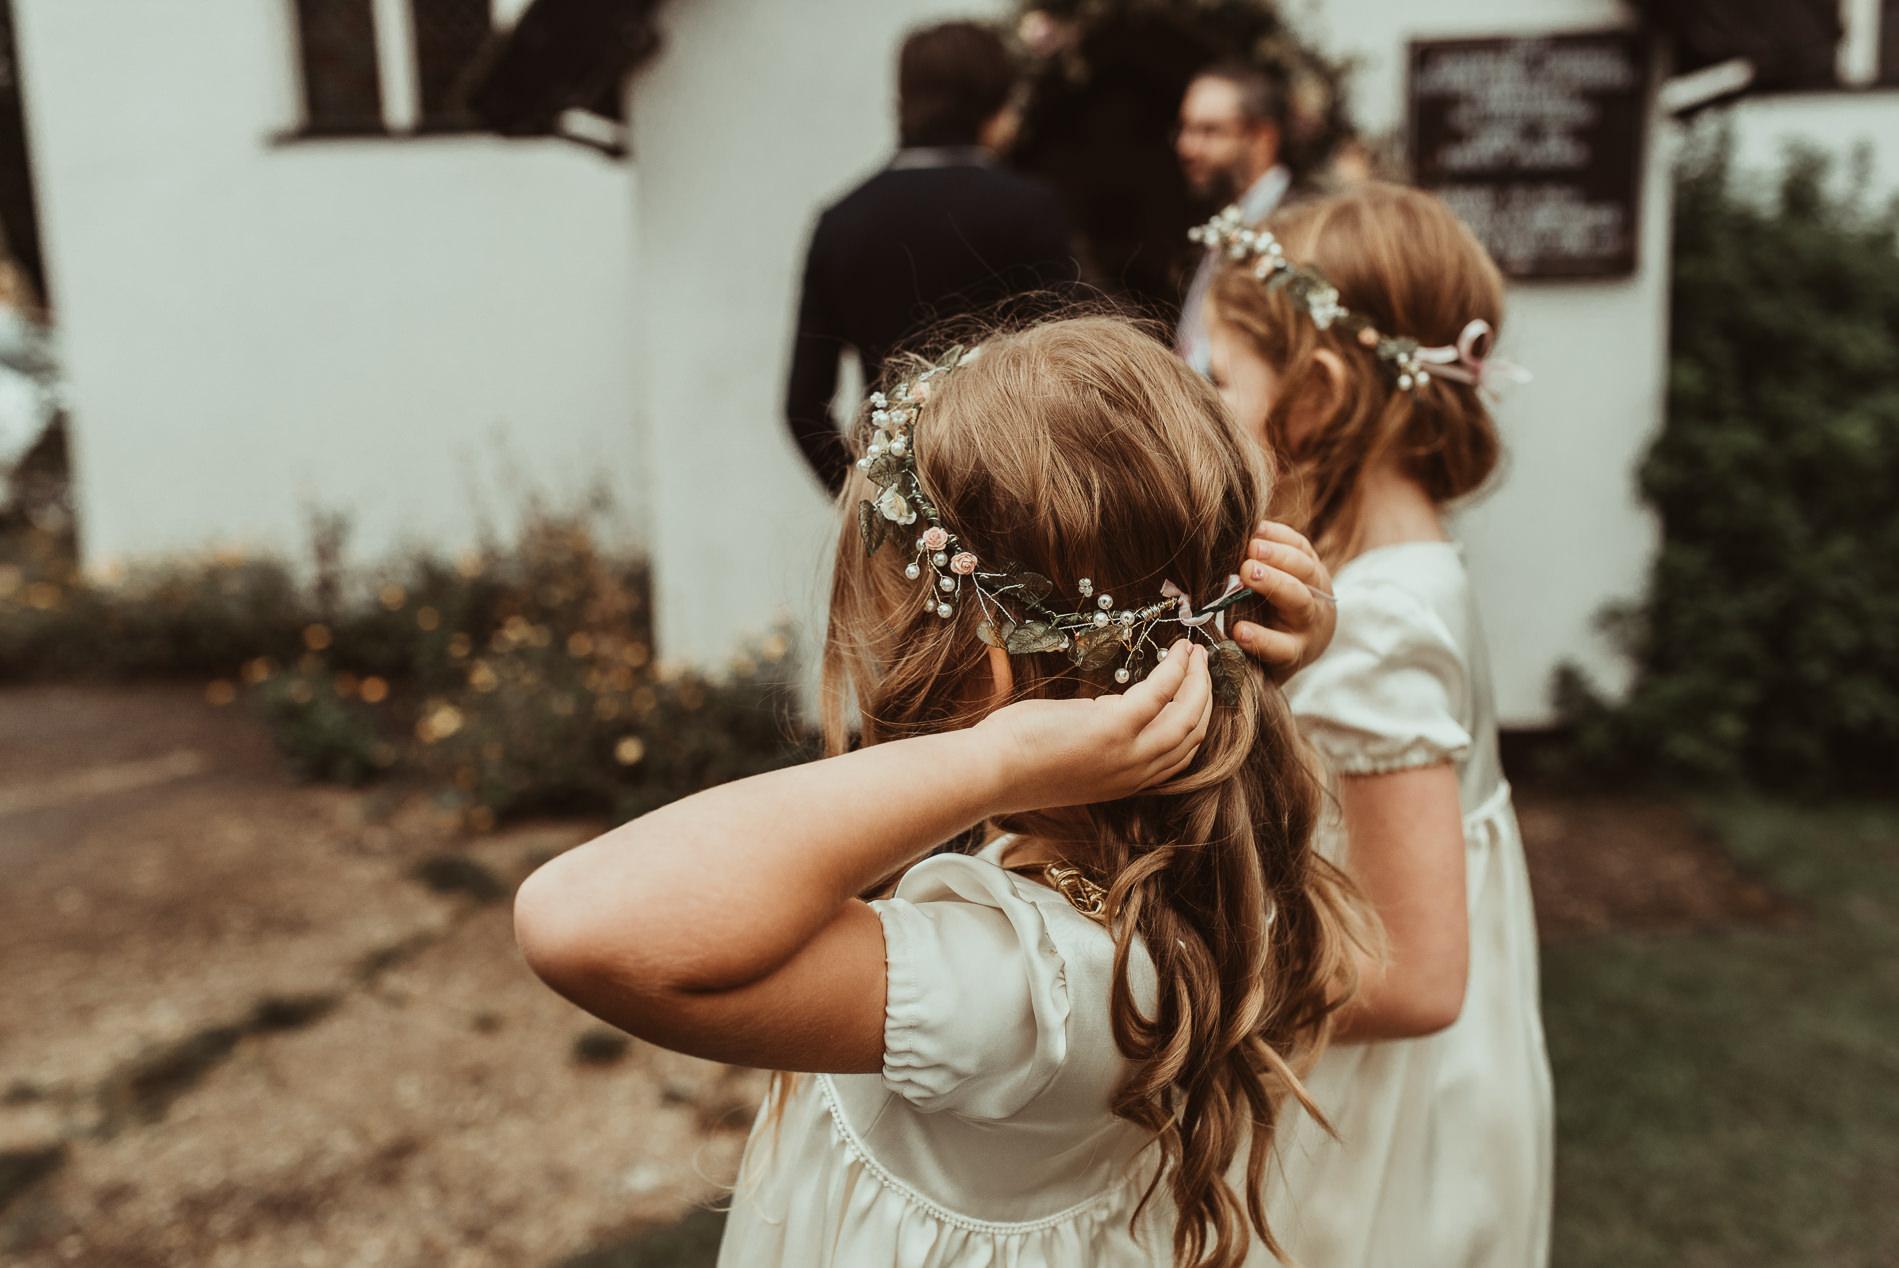 bohemian_wedding_lawshall_church_garden31